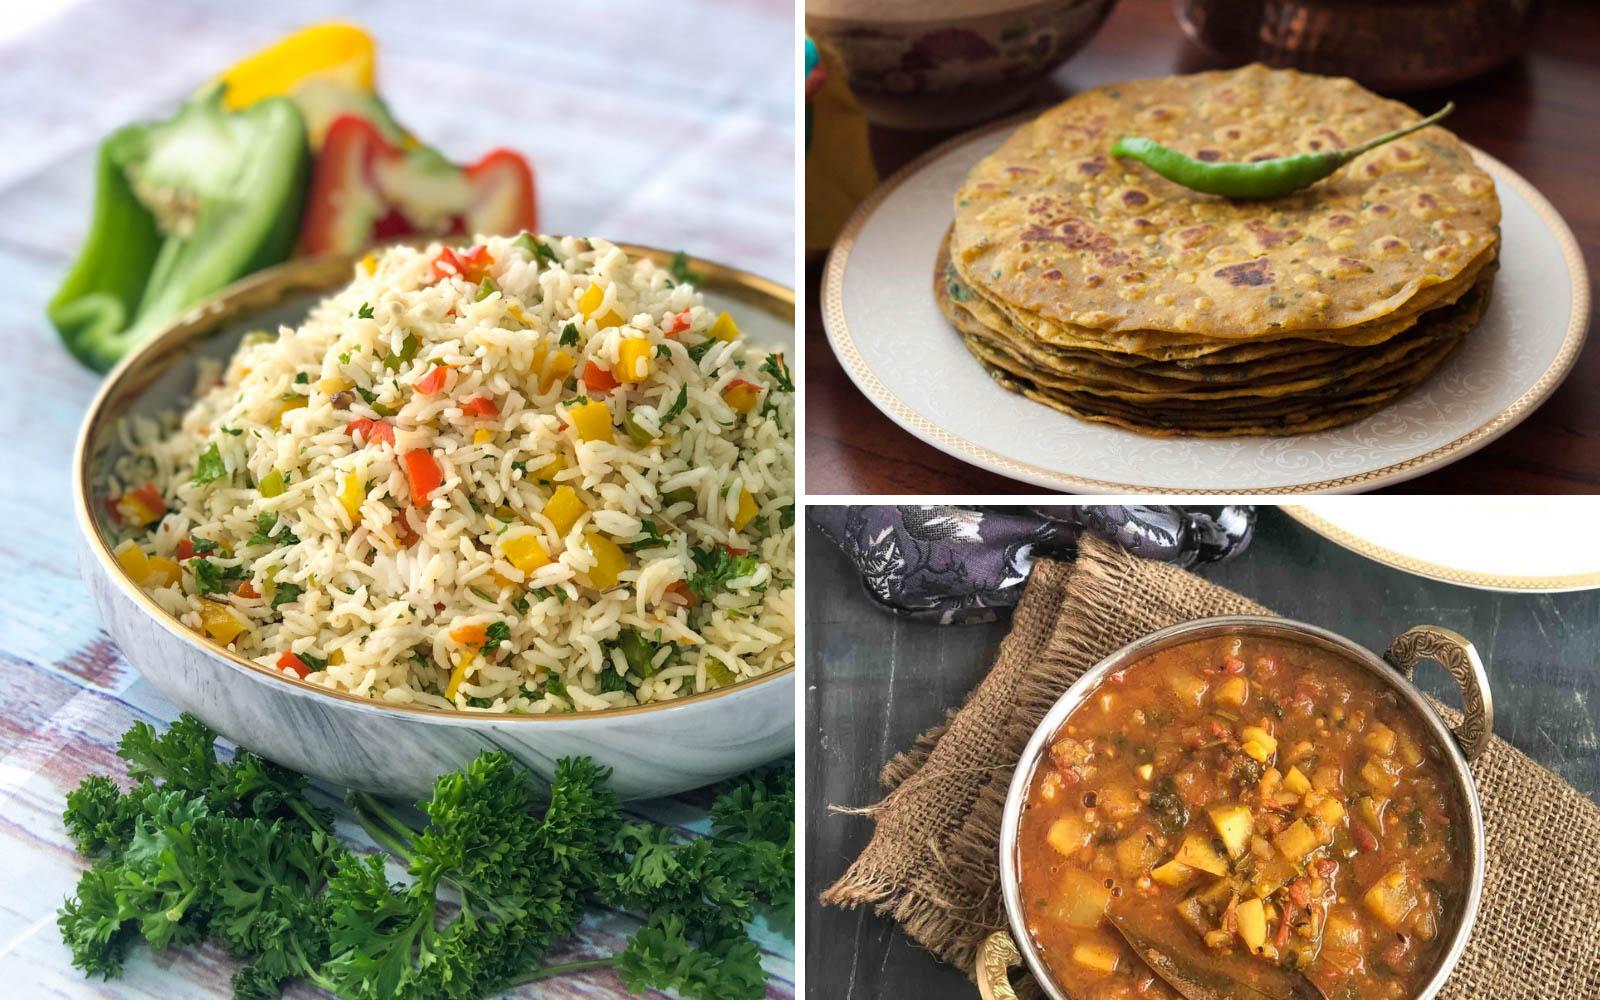 Kids Lunch Box Menu Plan-Veggie Rava Idli, Aloo Raswala Sabzi, Bell pepper Rice & More